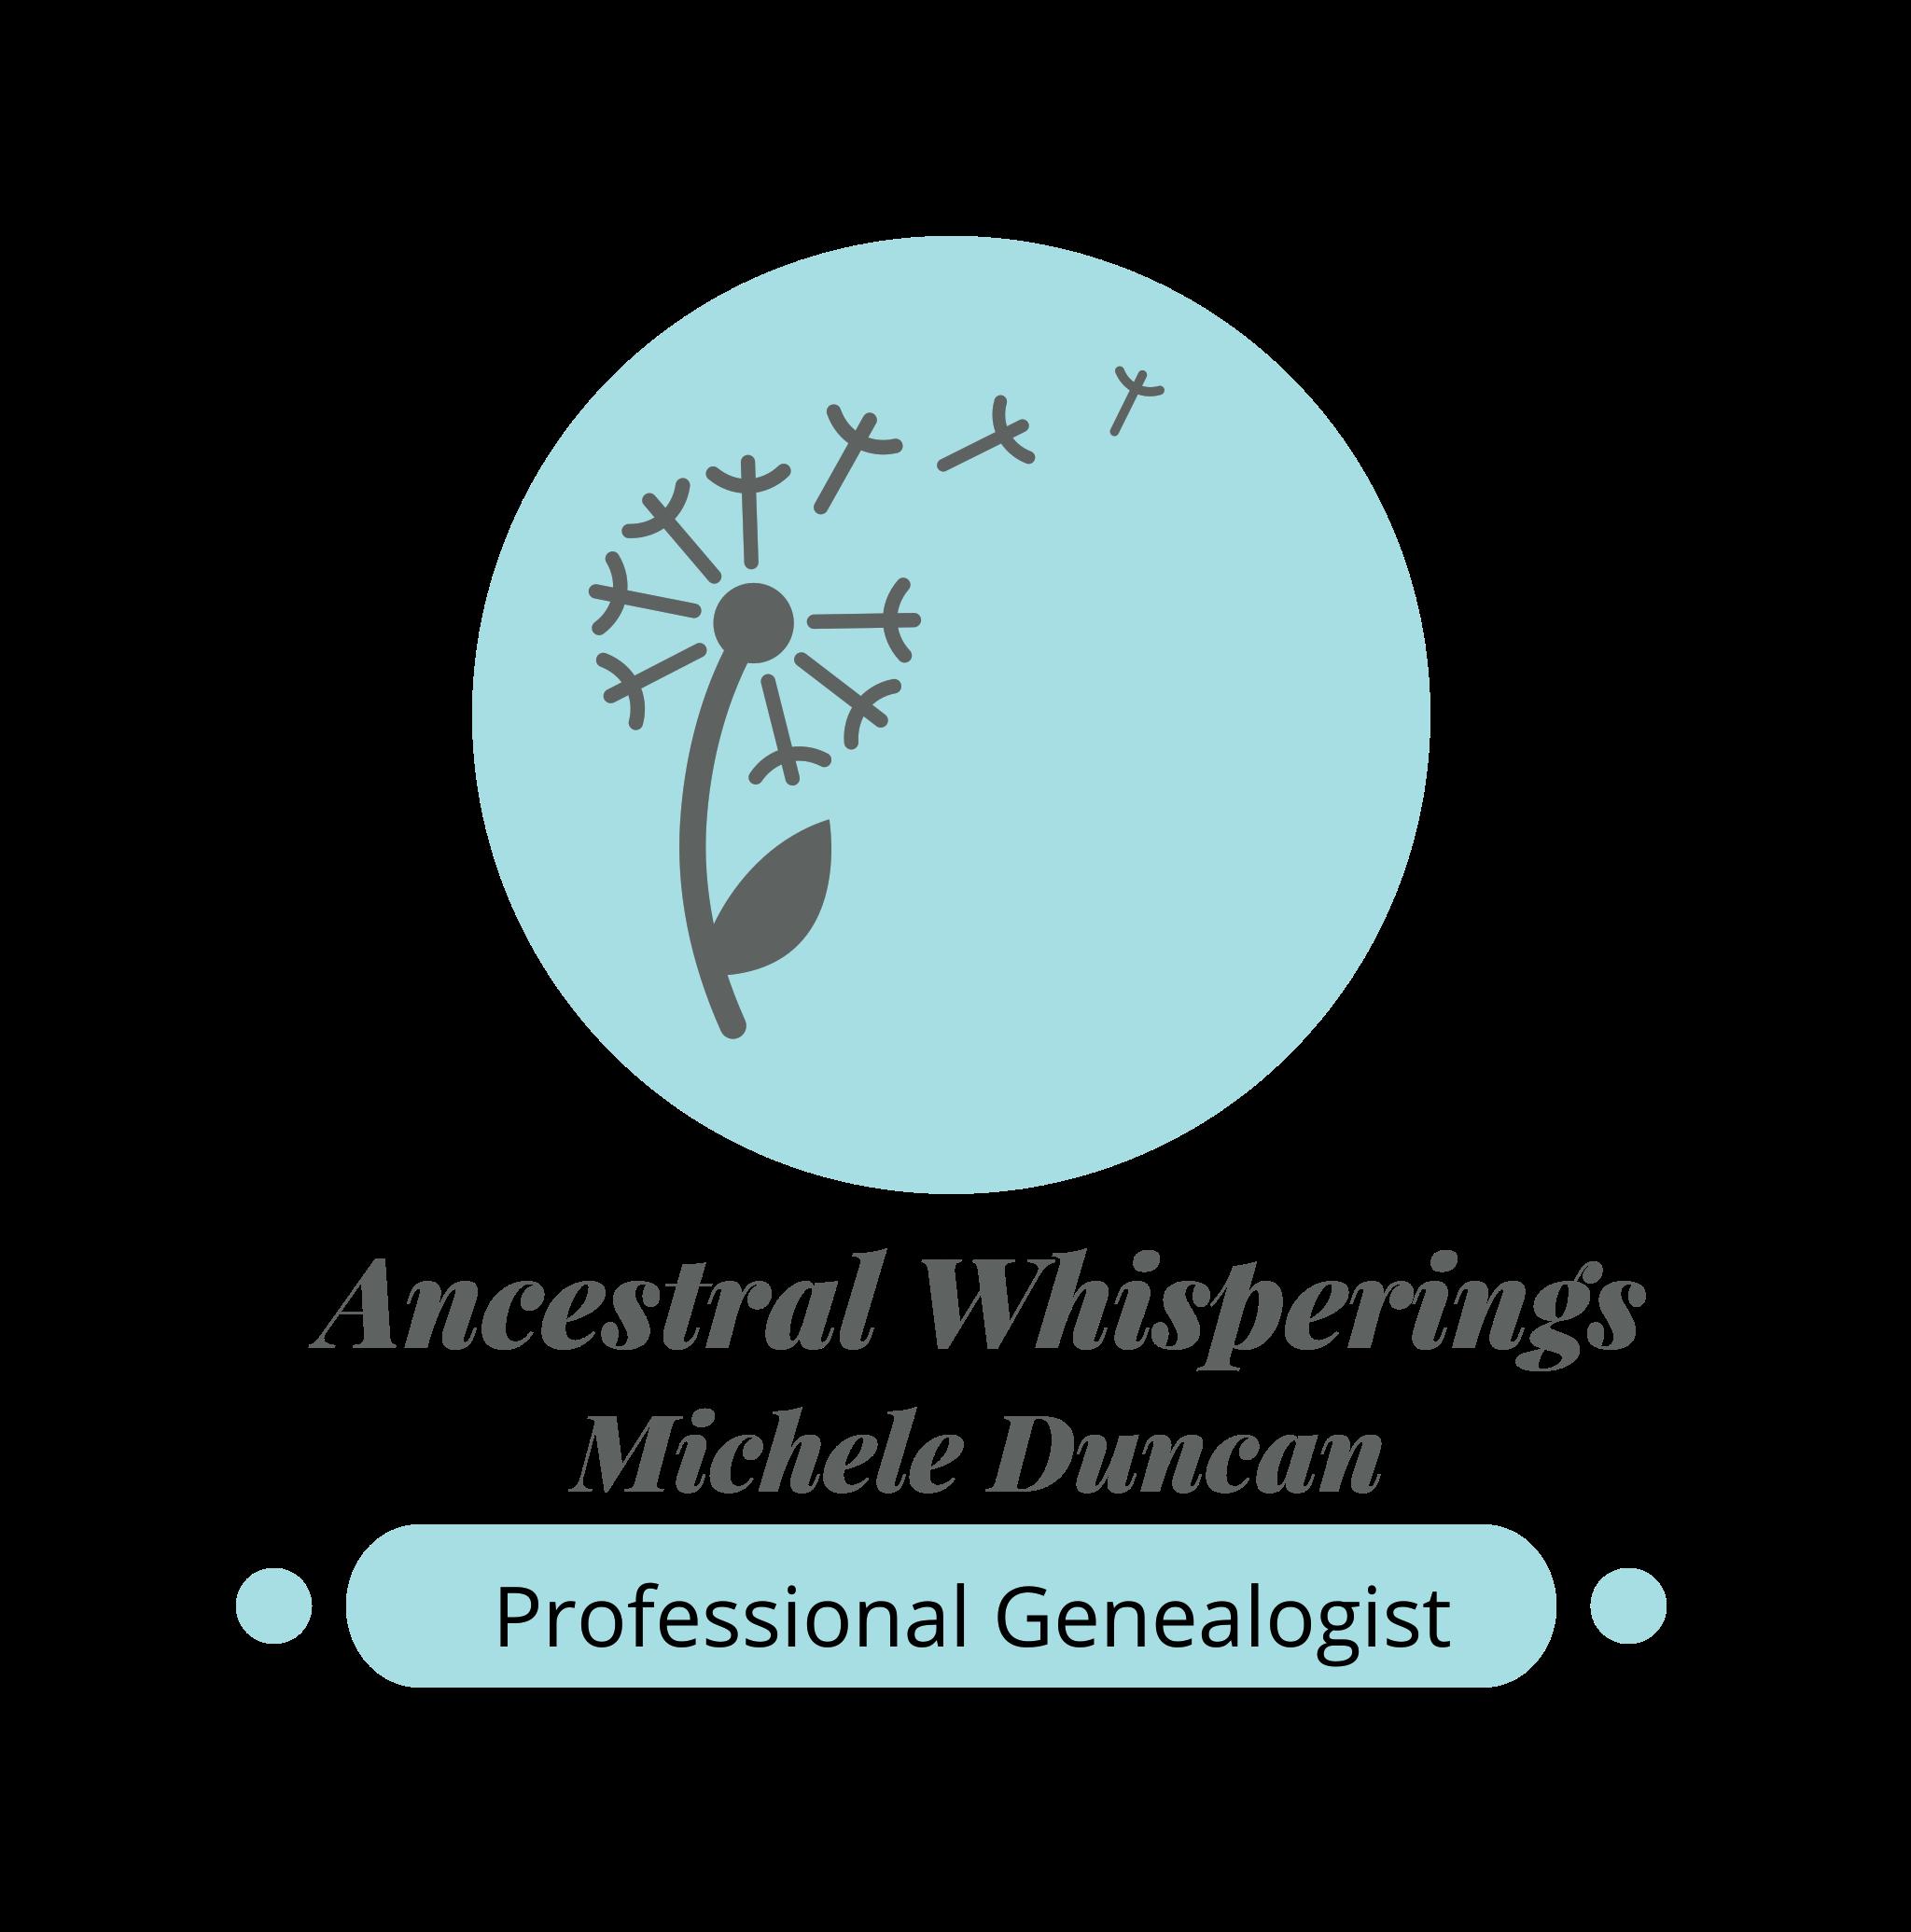 Ancestral Whisperings